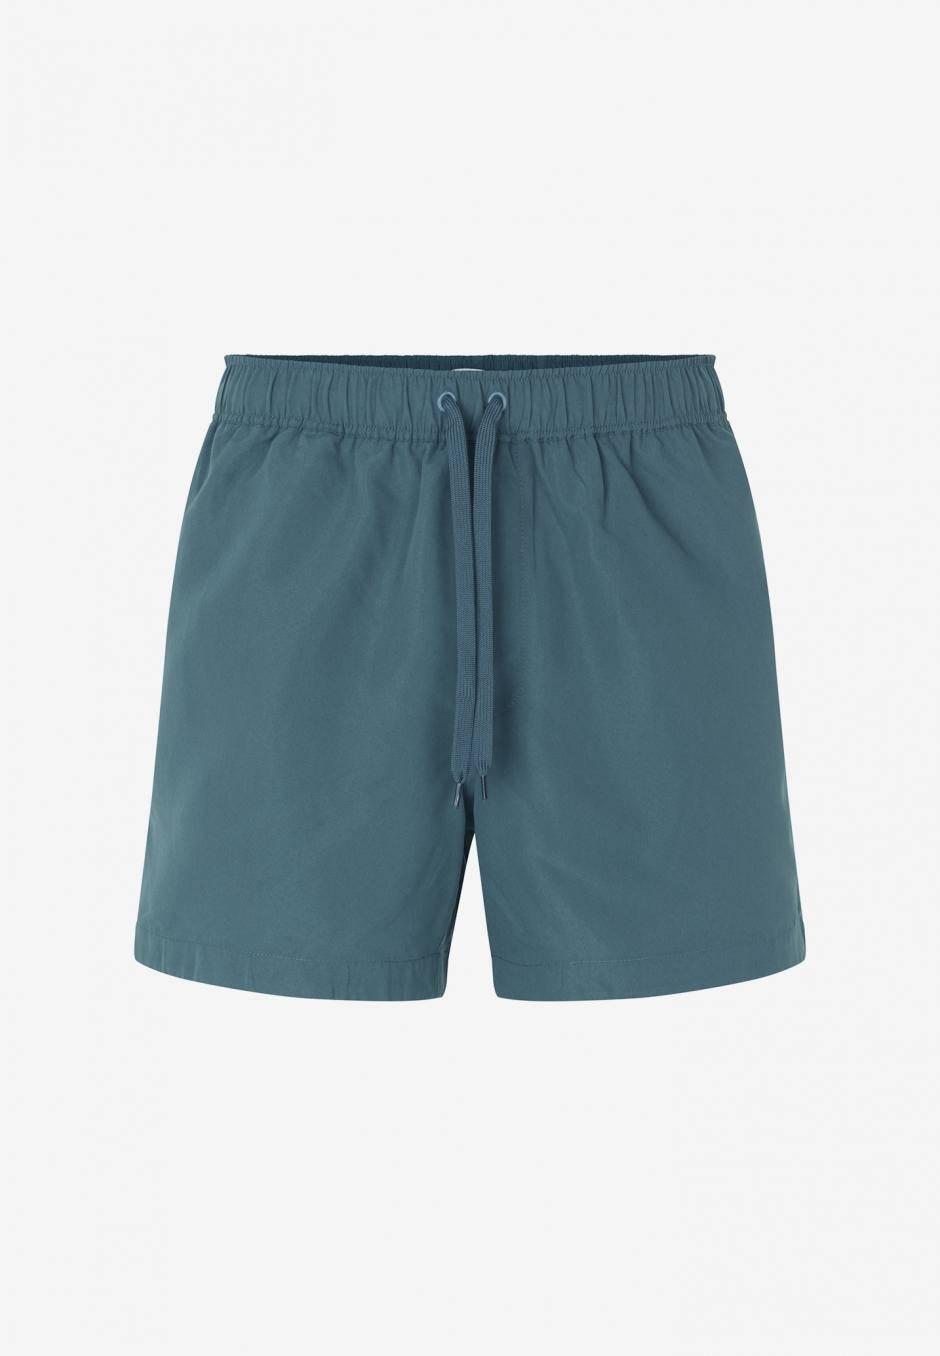 Samsøe Samsøe Mason Swim Shorts